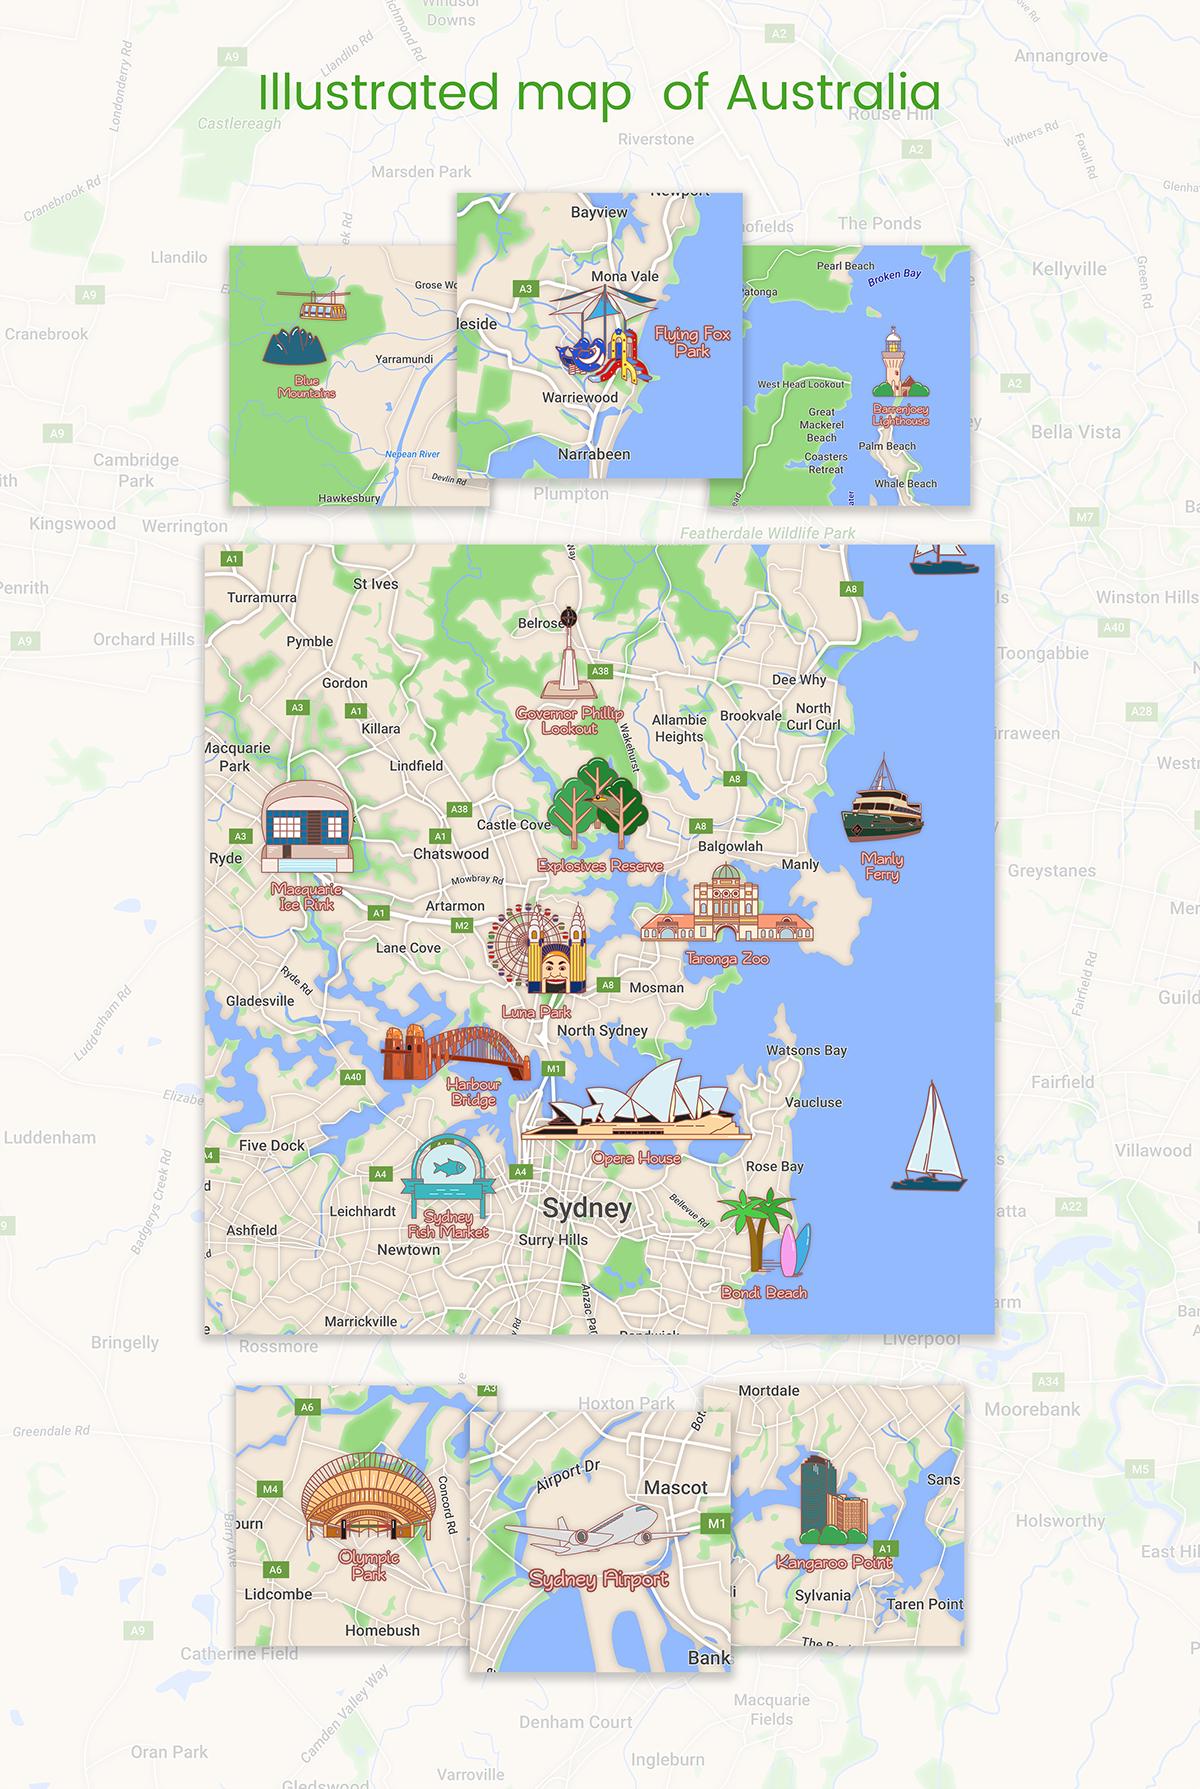 Map Of Australia Sydney.Illustrated Map Of Australia Sydney And Suburbs On Behance Maps